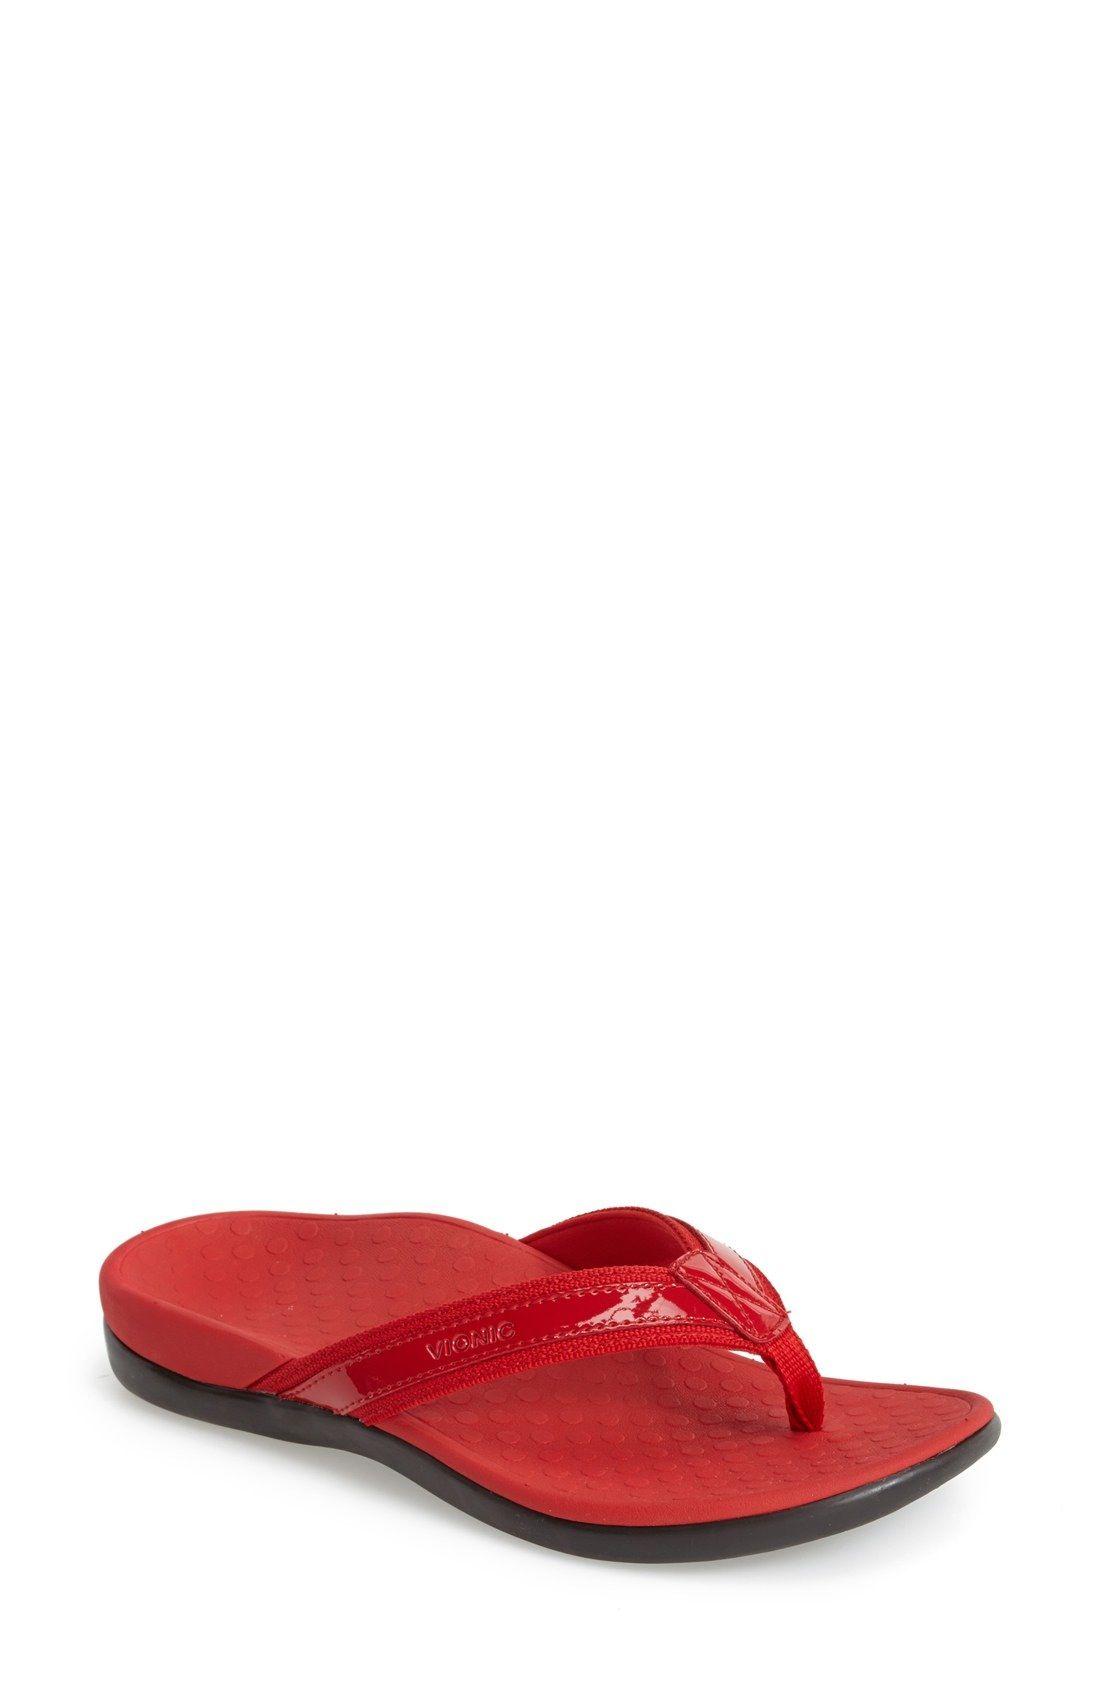 ec4b6d64e9fd Vionic  Tide II  Flip Flop (Women) available at  Nordstrom